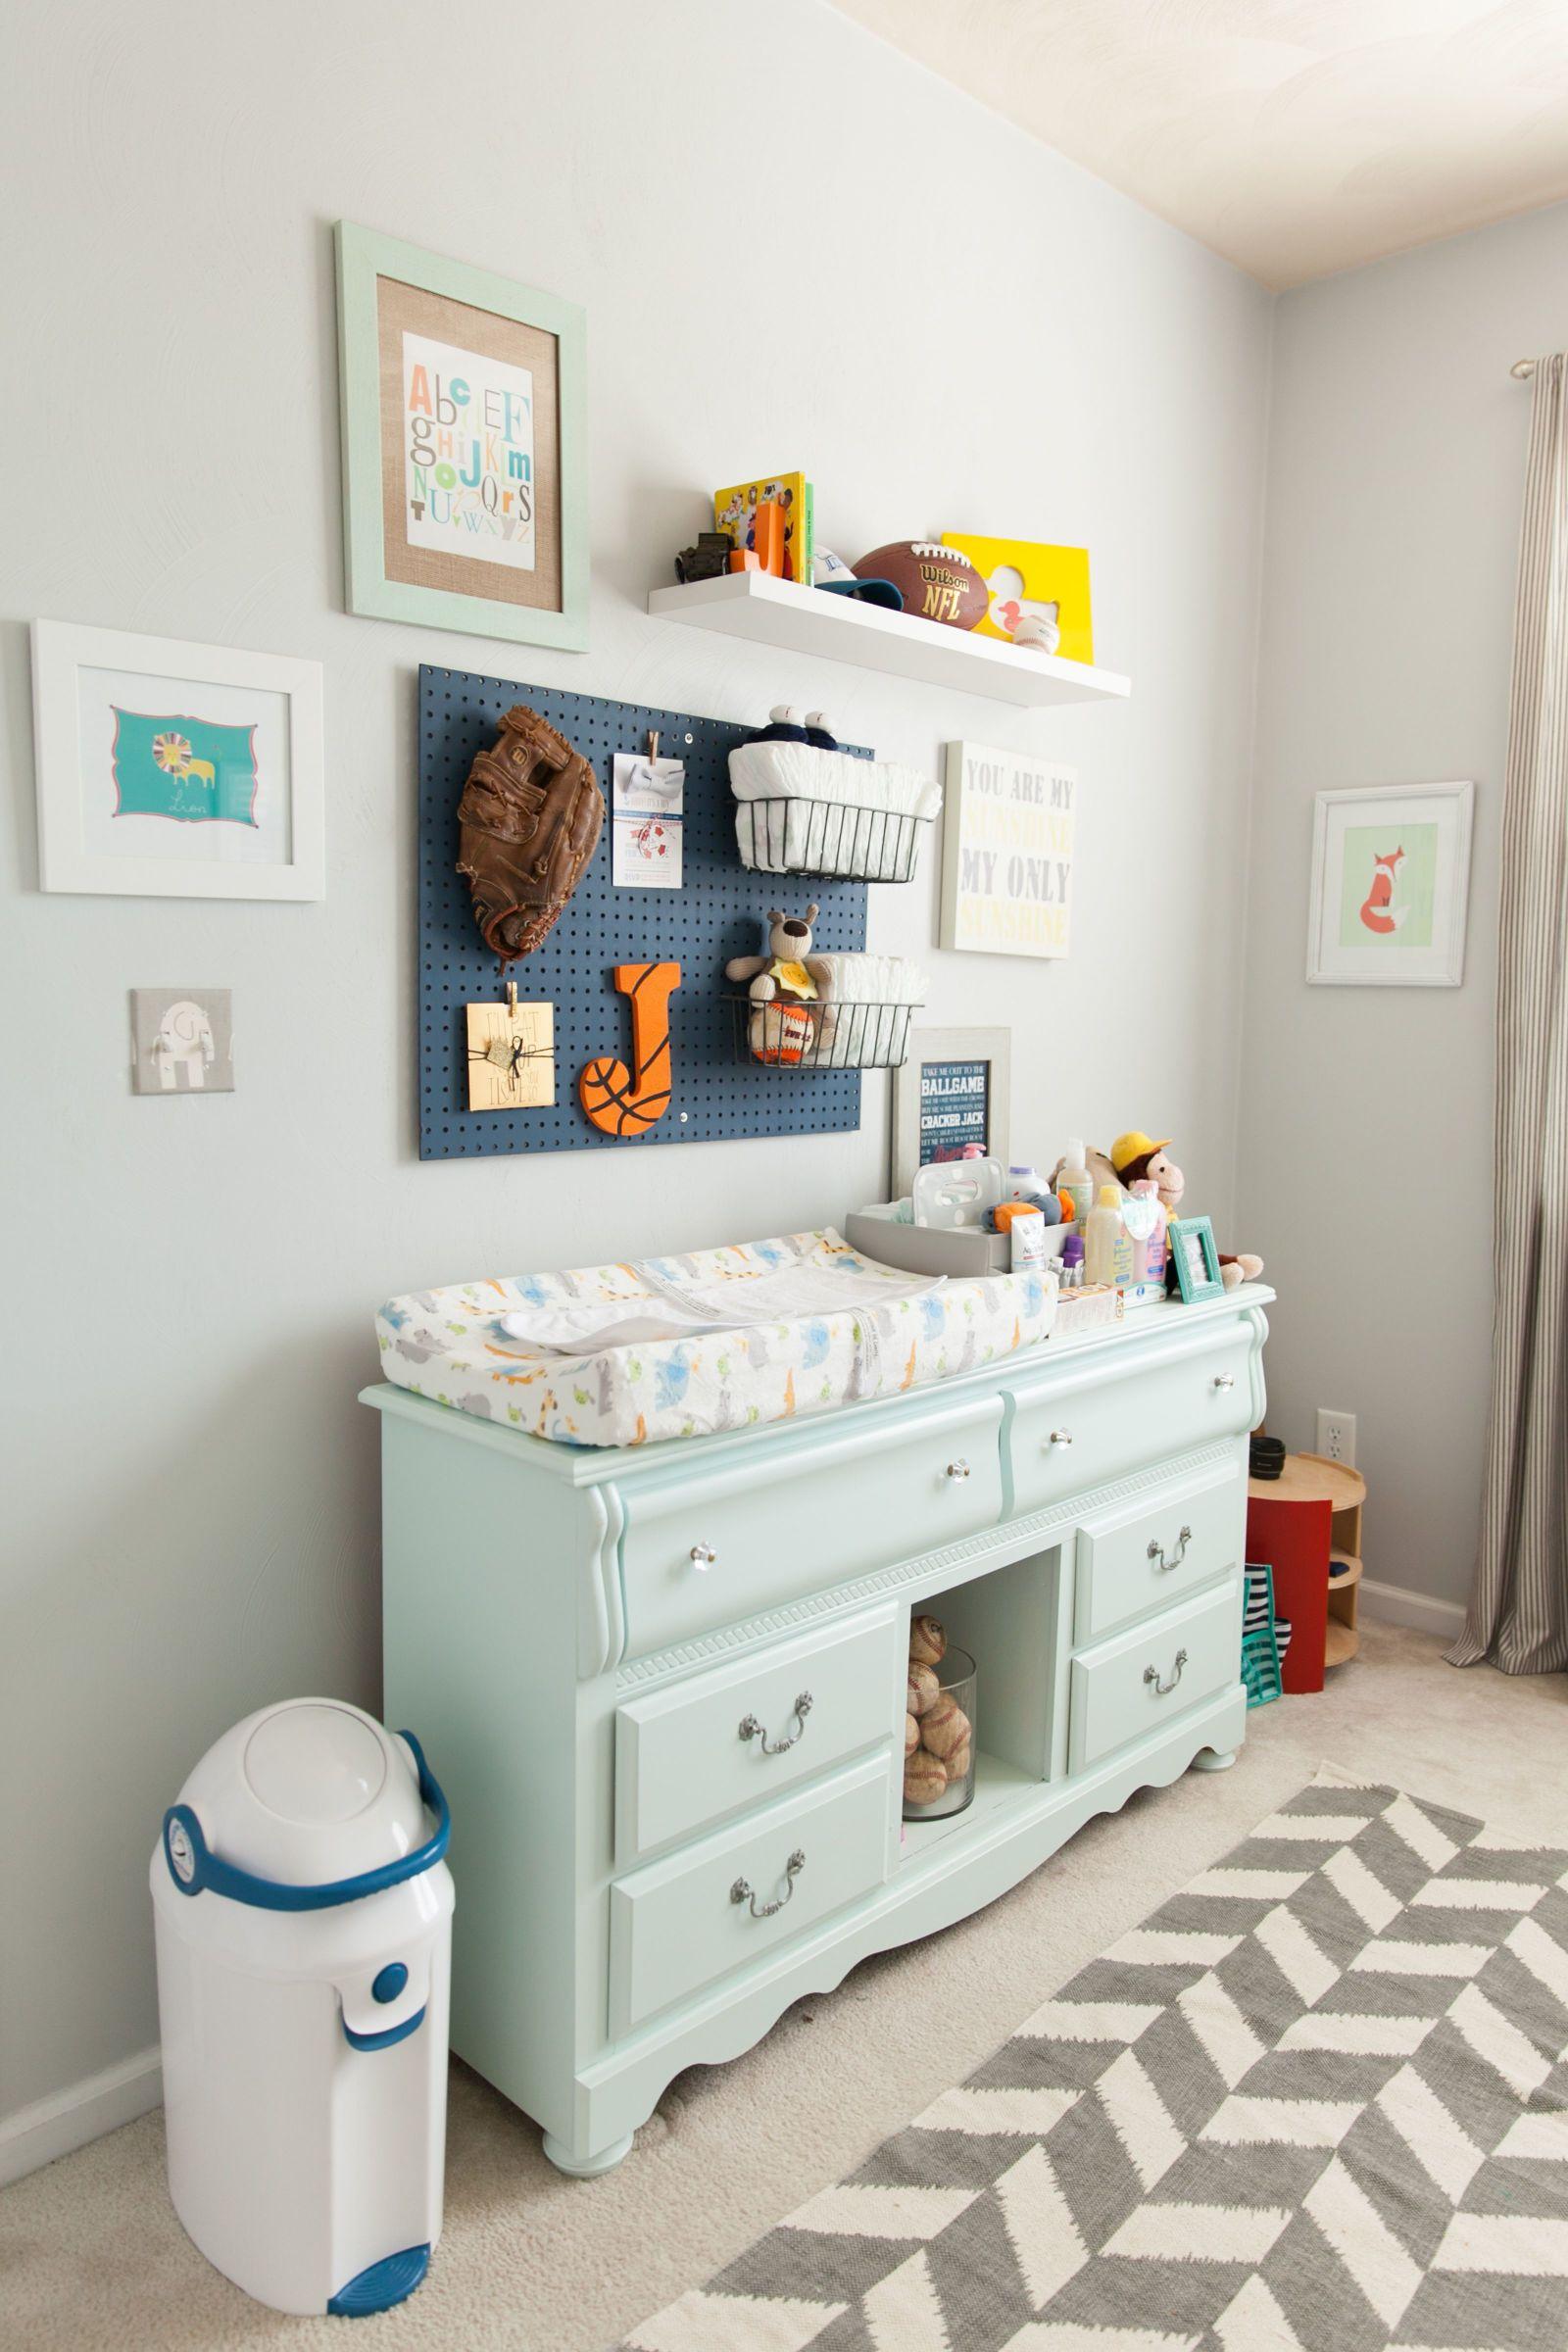 14 Genius Storage Ideas For Your Kidu0027s Room